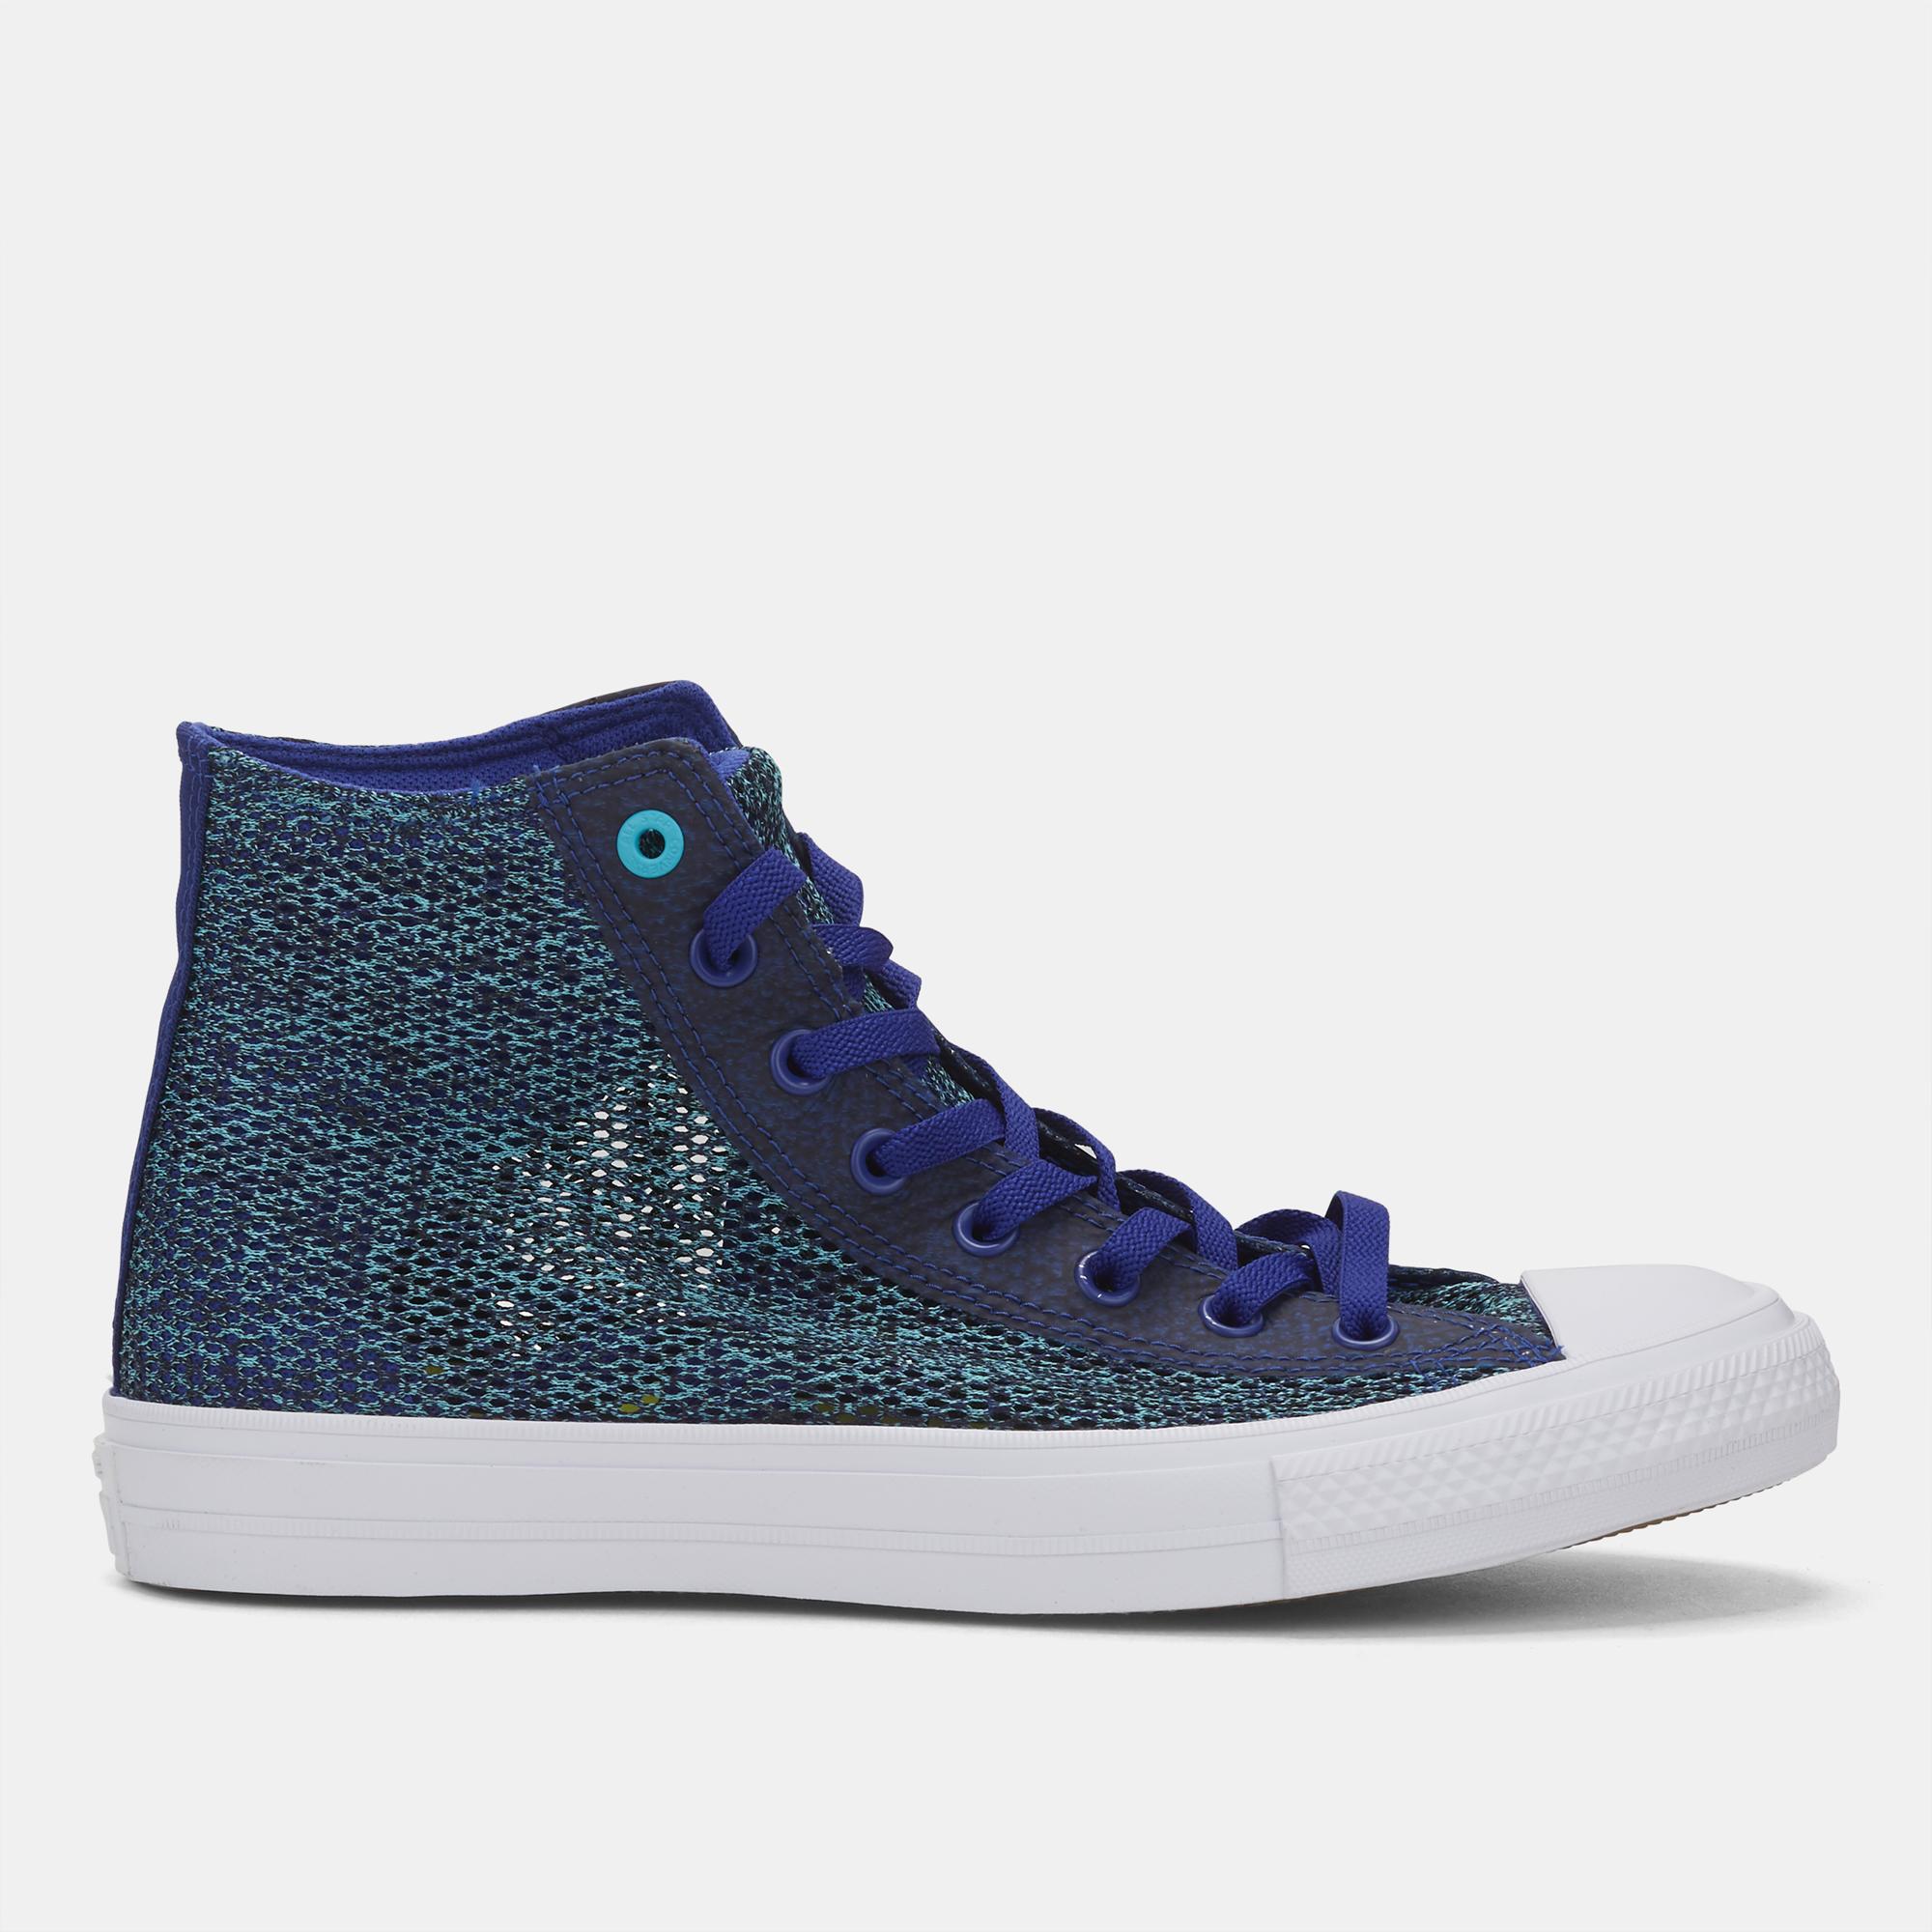 5b379cdd9bdd6c Shop Multi Converse Chuck Taylor All Star II Open Knit Hi-Top Shoe ...